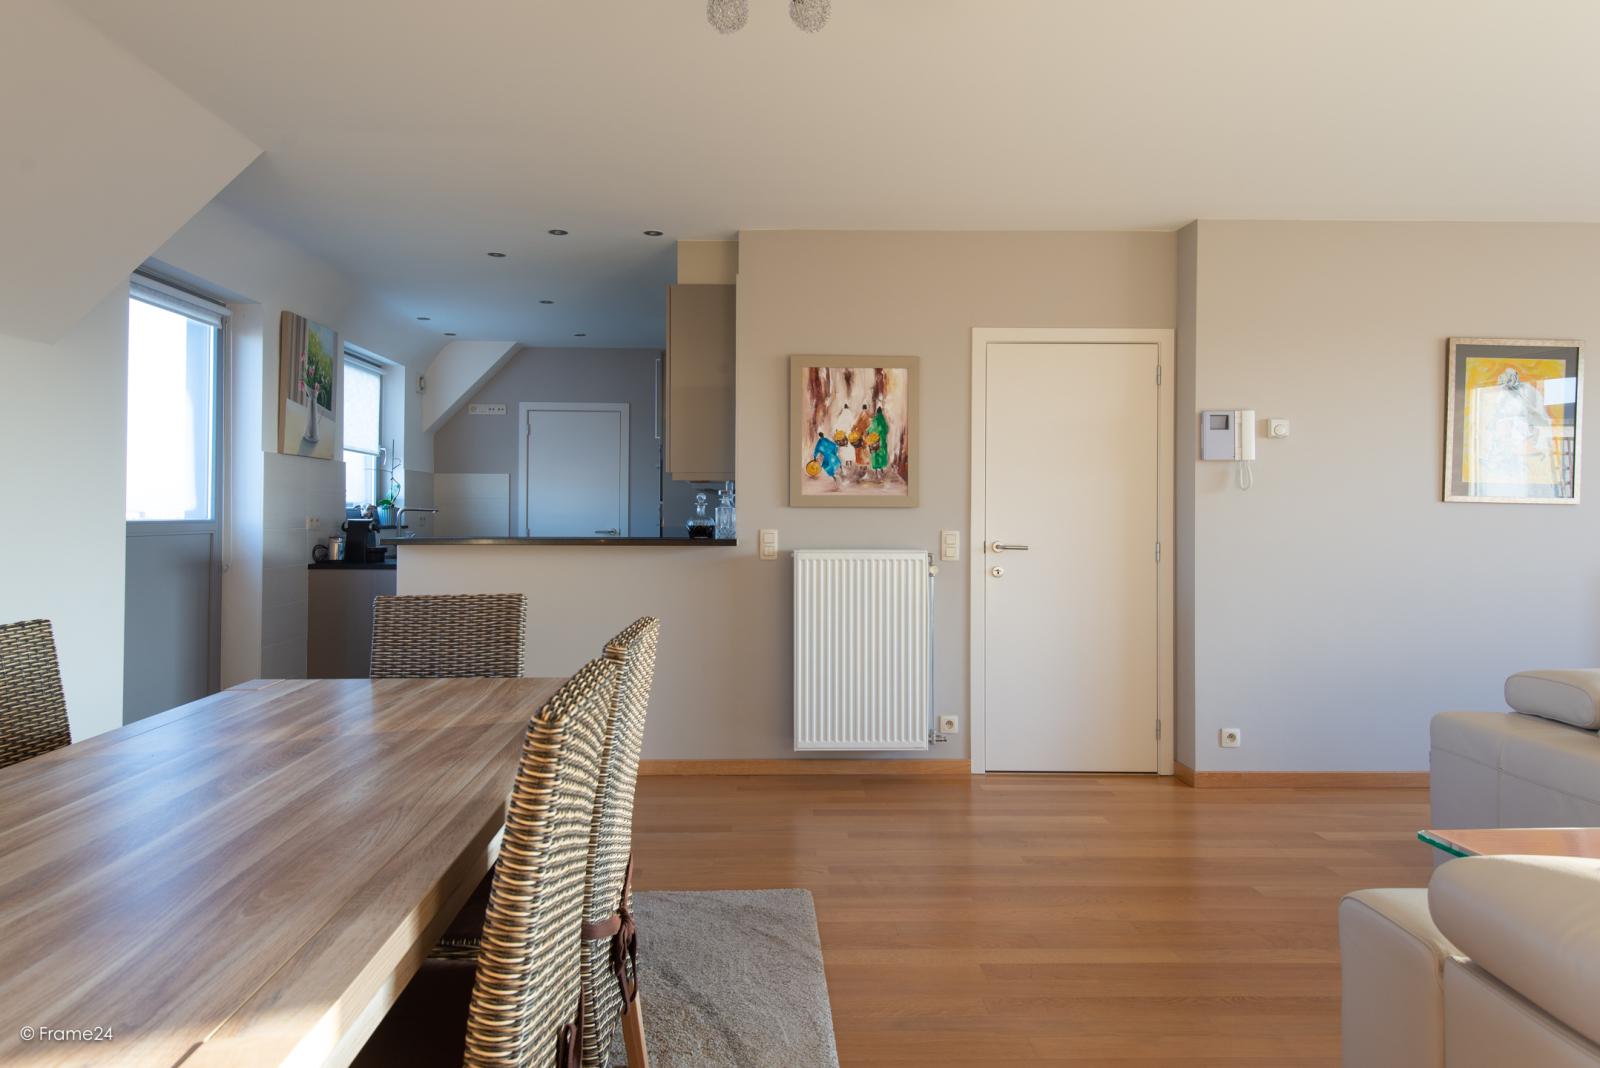 Riant dakappartement (130 m²) met zonnig terras in residentie 'Eyserhof' te Wijnegem! afbeelding 10